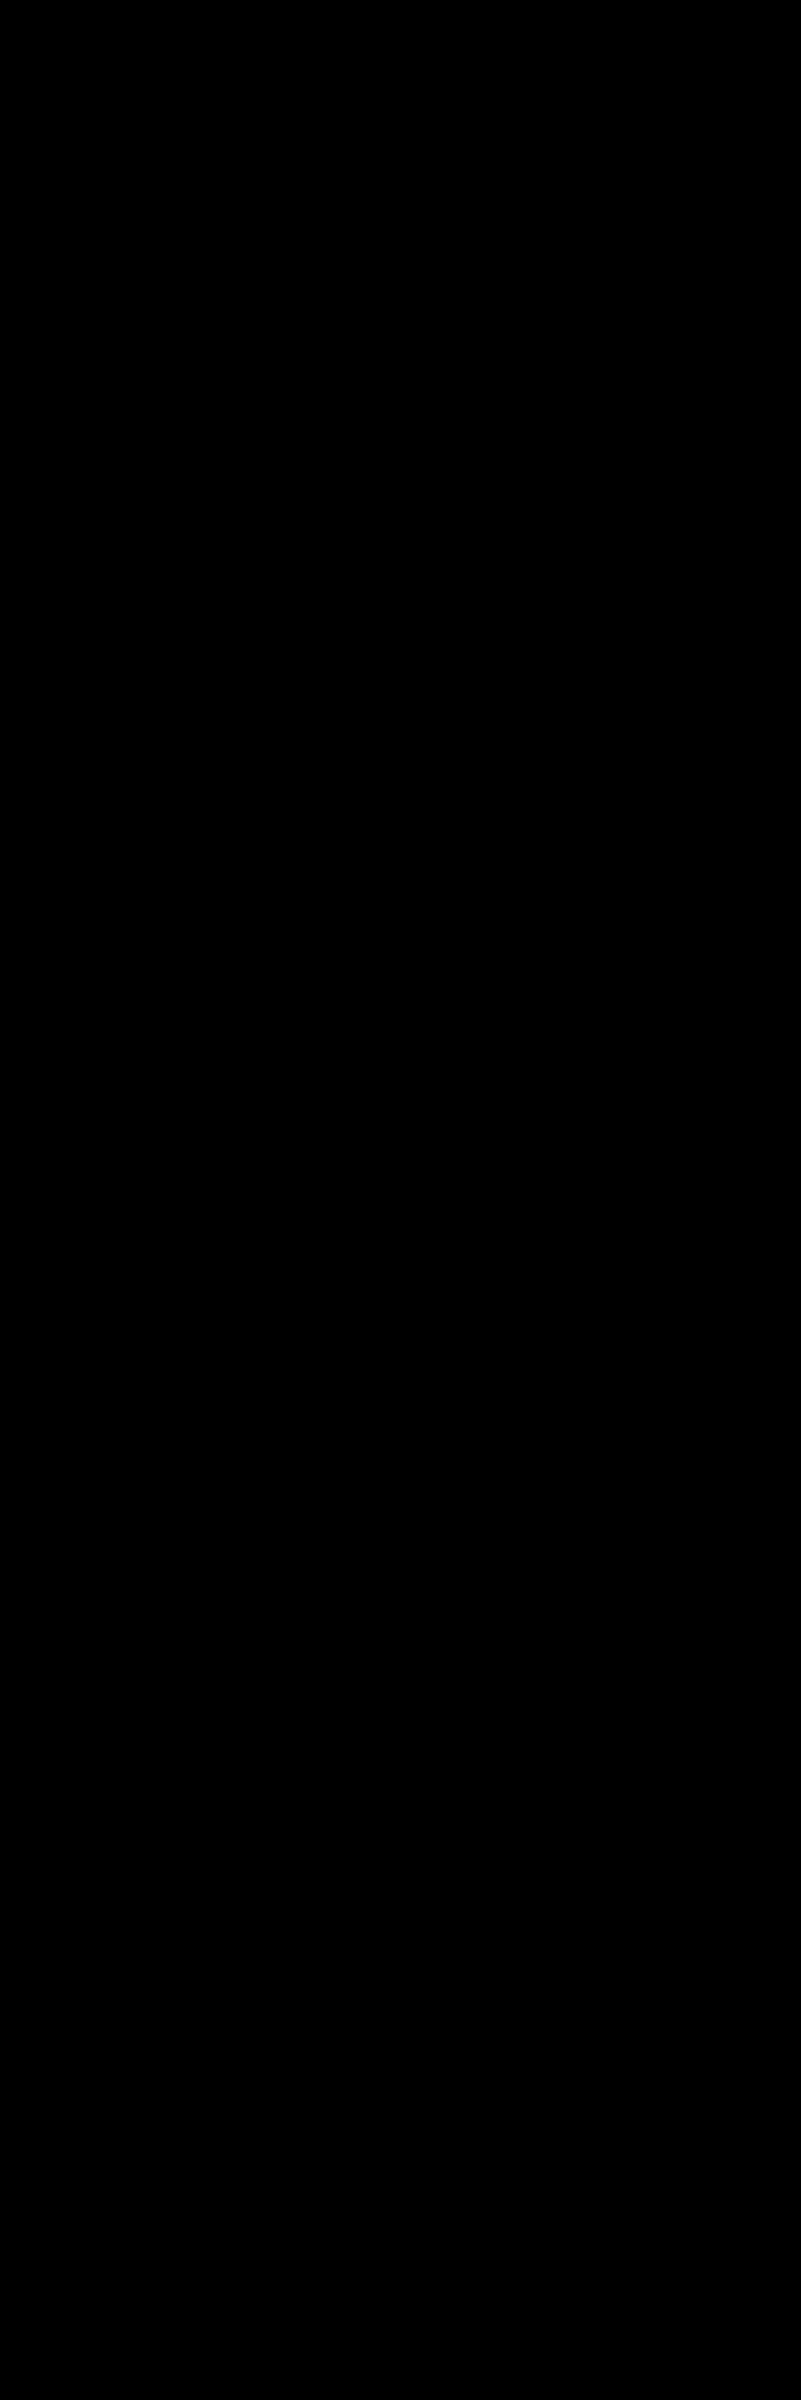 801x2400 Silhouette Businessman Png Clipart